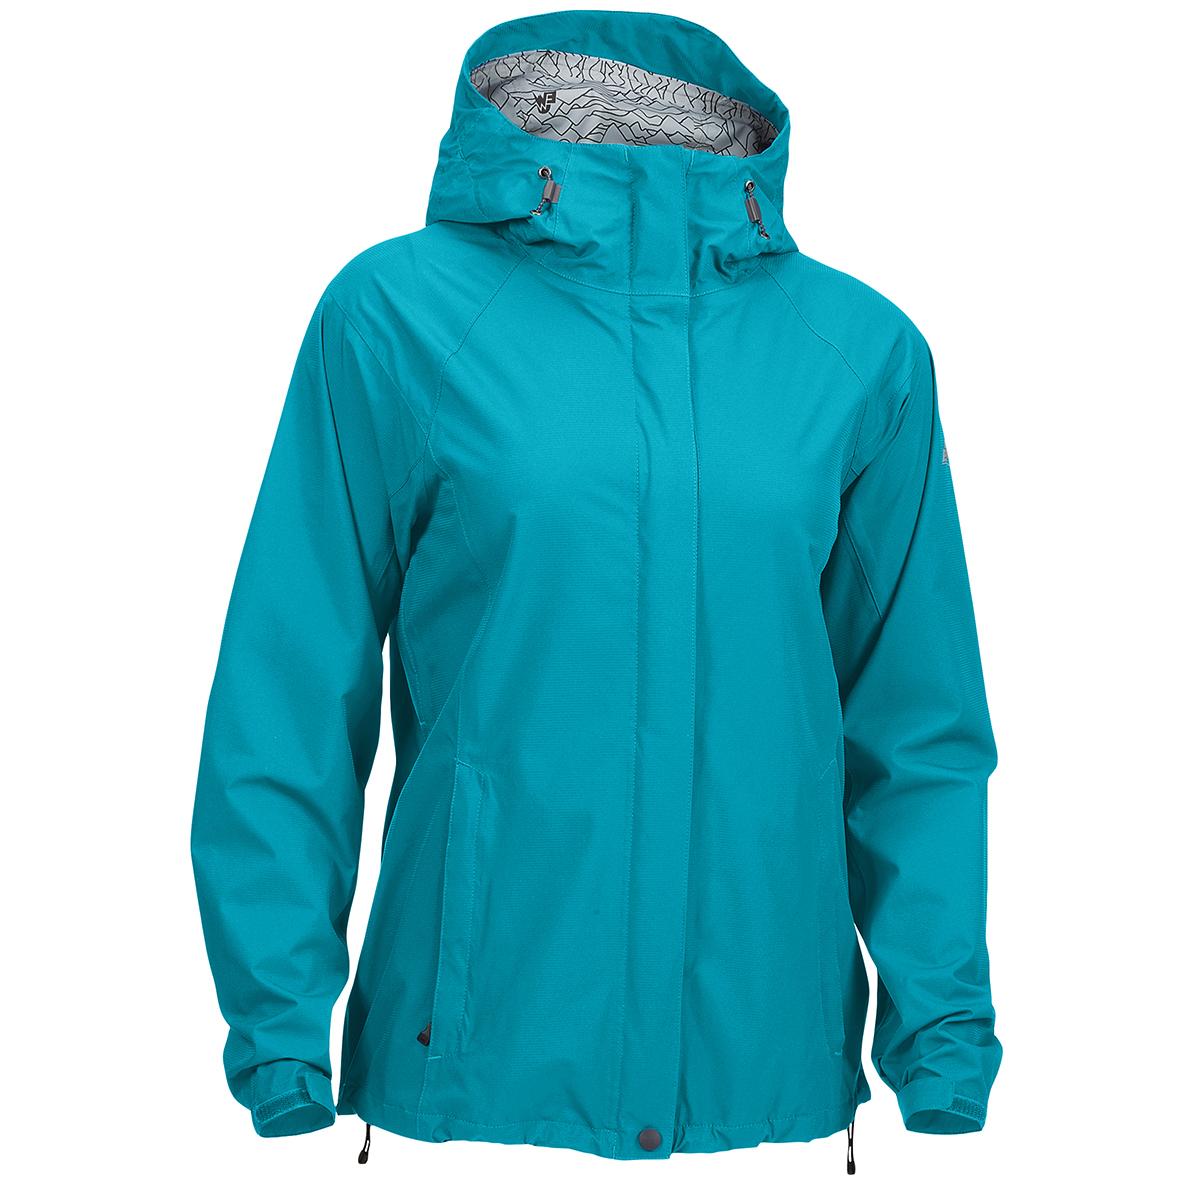 Ems Women's Thunderhead Peak Rain Jacket - Blue, S